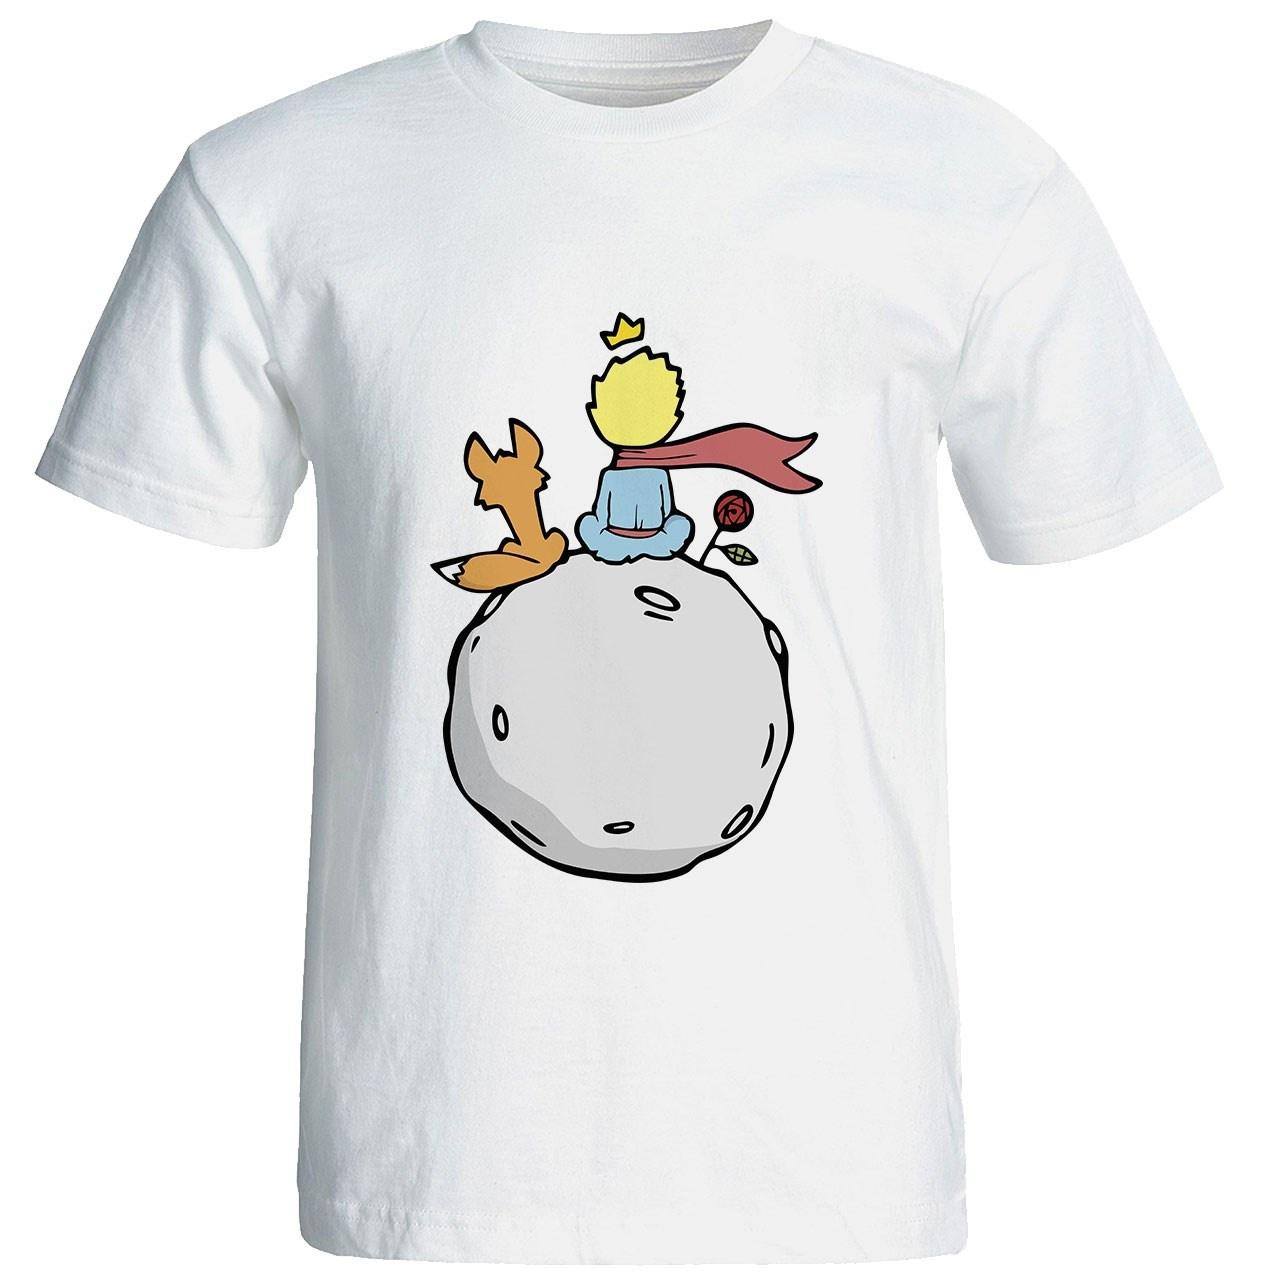 Photo of تی شرت آستین کوتاه شین دیزاین طرح شازده کوچولو کد 4138